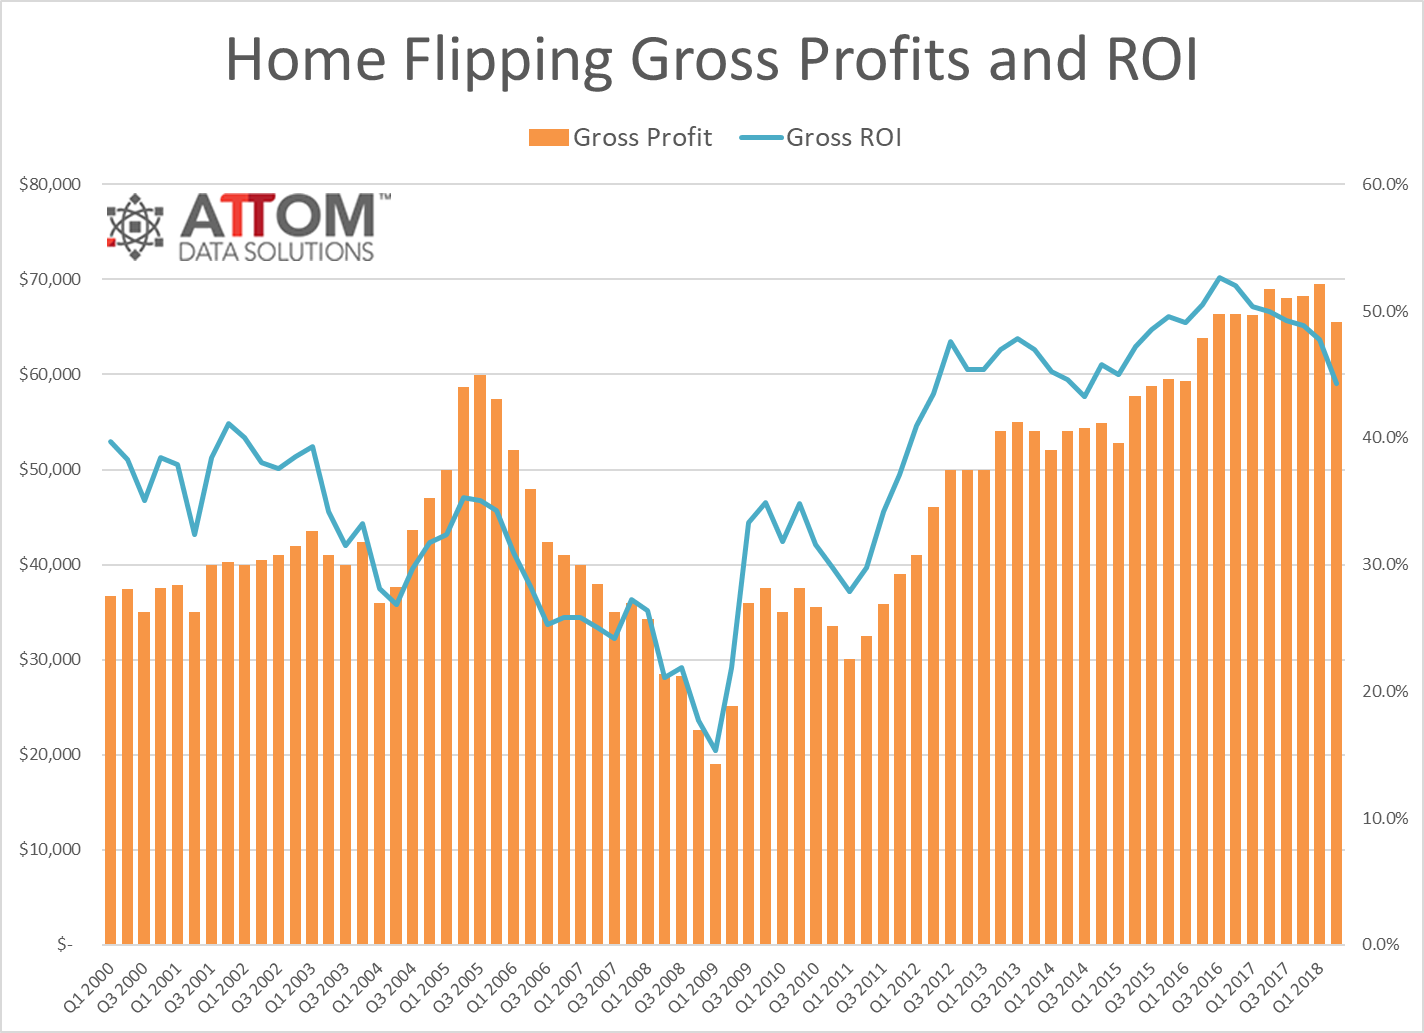 Home Flipping Gross Profits